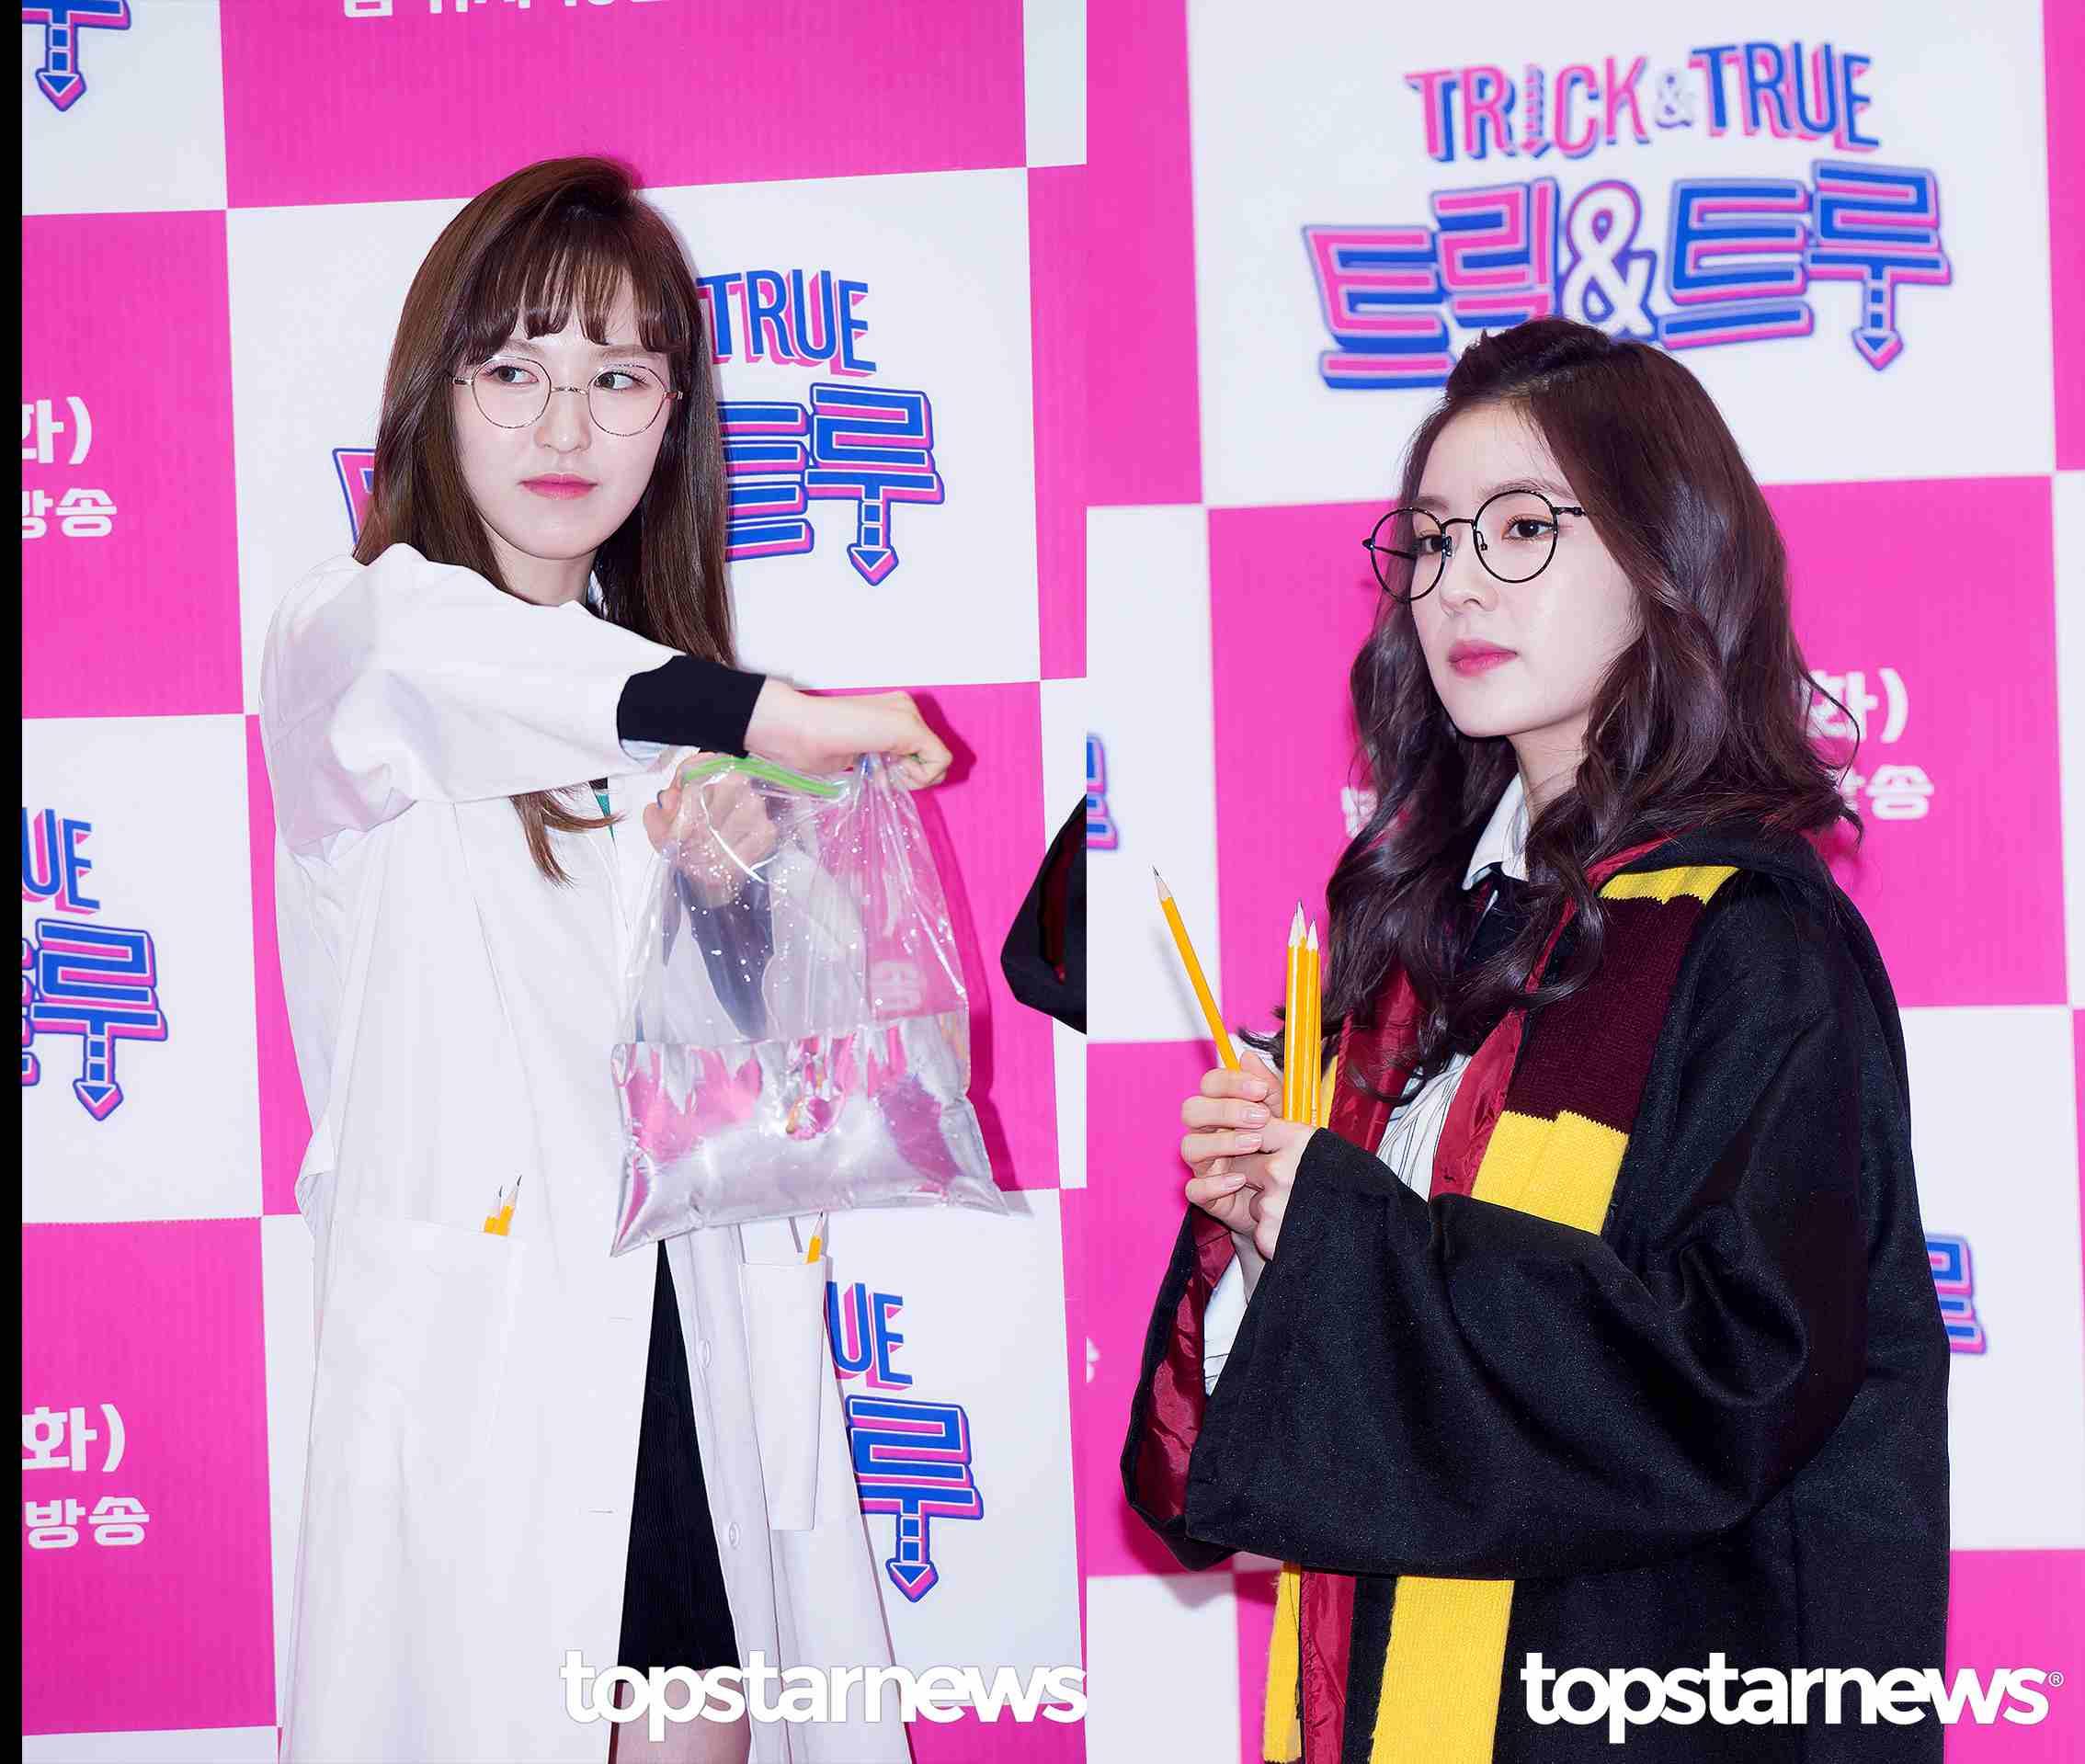 《Trick&True》是一檔新概念魔術科學節目,結合了神秘的科學與華麗的魔術,讓大家來判斷是魔術還是科學。Irene 和Wendy是這檔節目的固定嘉賓,兩人還一起參加了該節目的製作發表會。